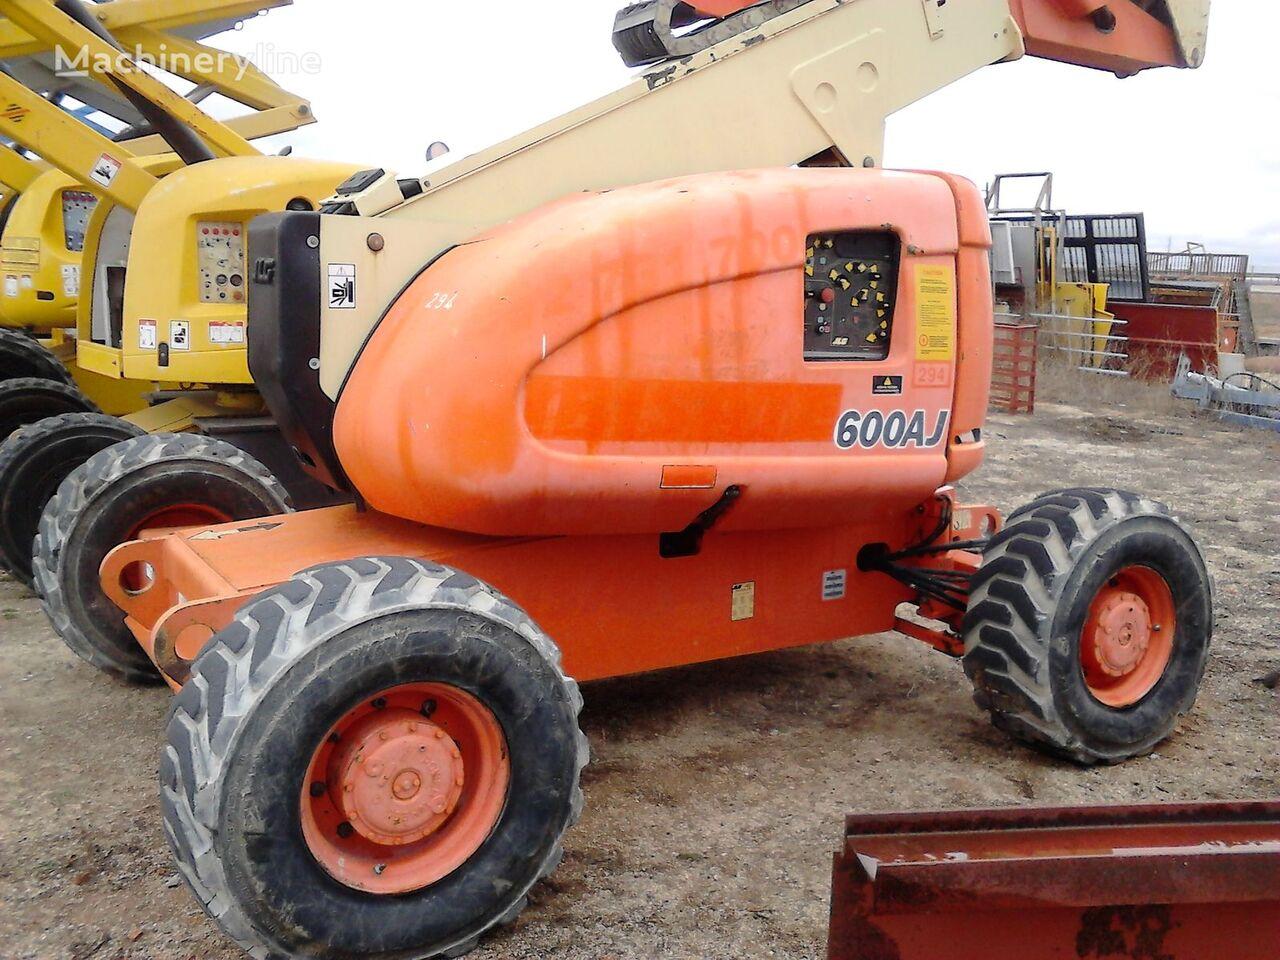 JLG 600 AJ articulated boom lift